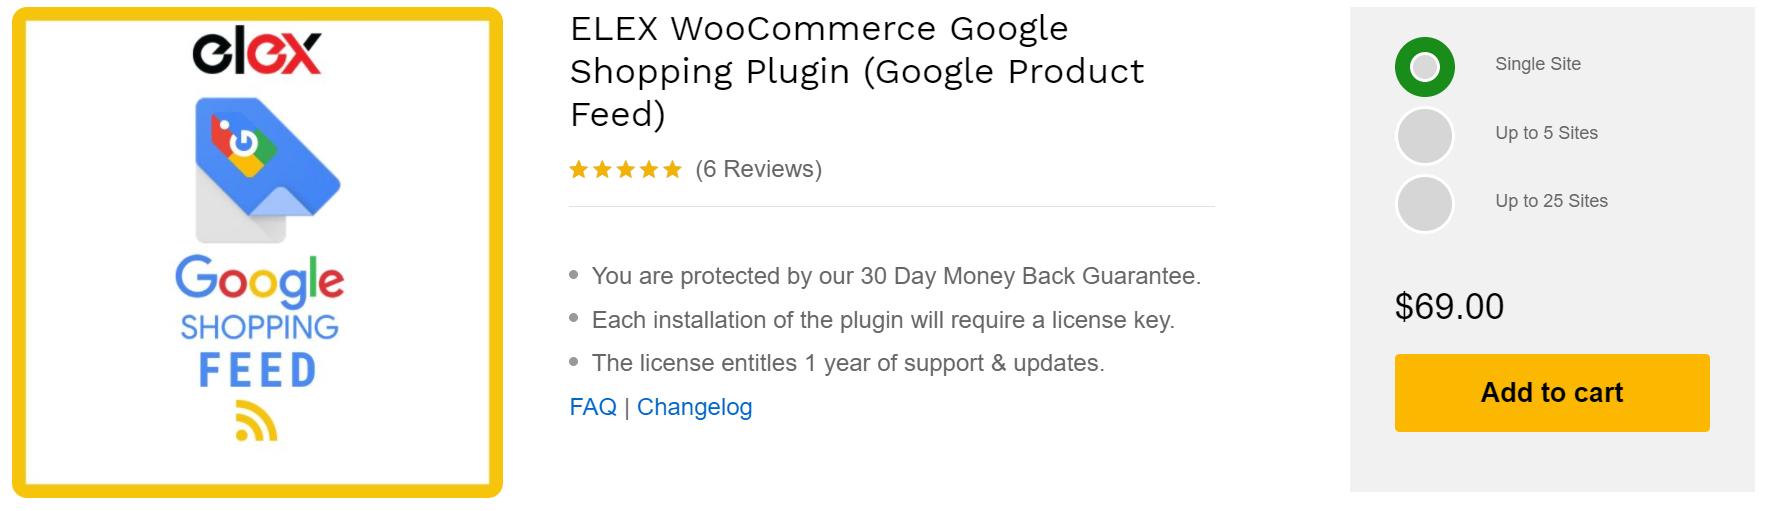 Google Shopping Feed Plugins | WooCommerce Plugins for Google Shopping Feed | ELEX Woocommerce Google Shopping Plugin